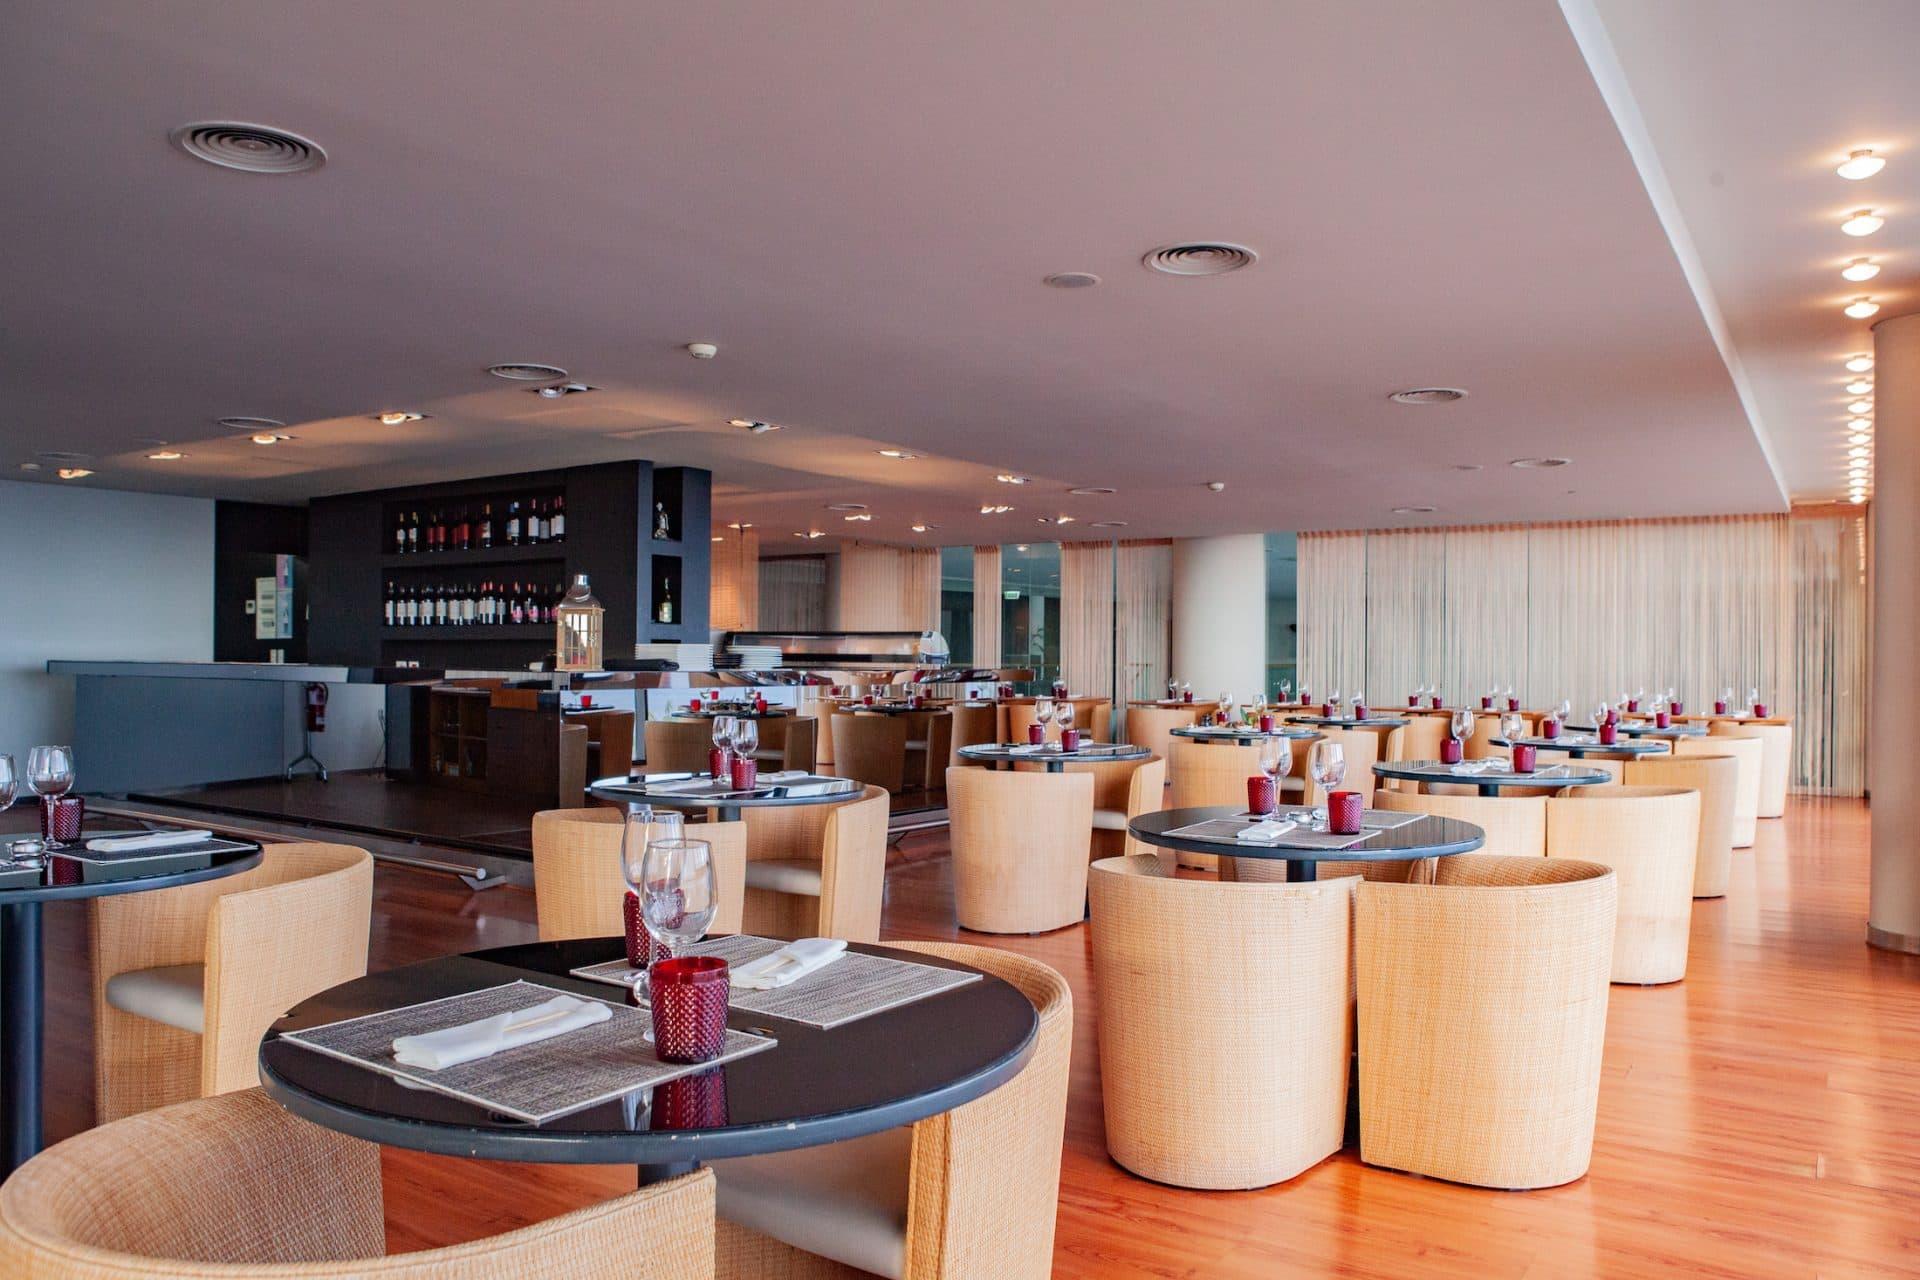 koi-sushi-restaurant-interior-VidaMar-Hotels-Resorts